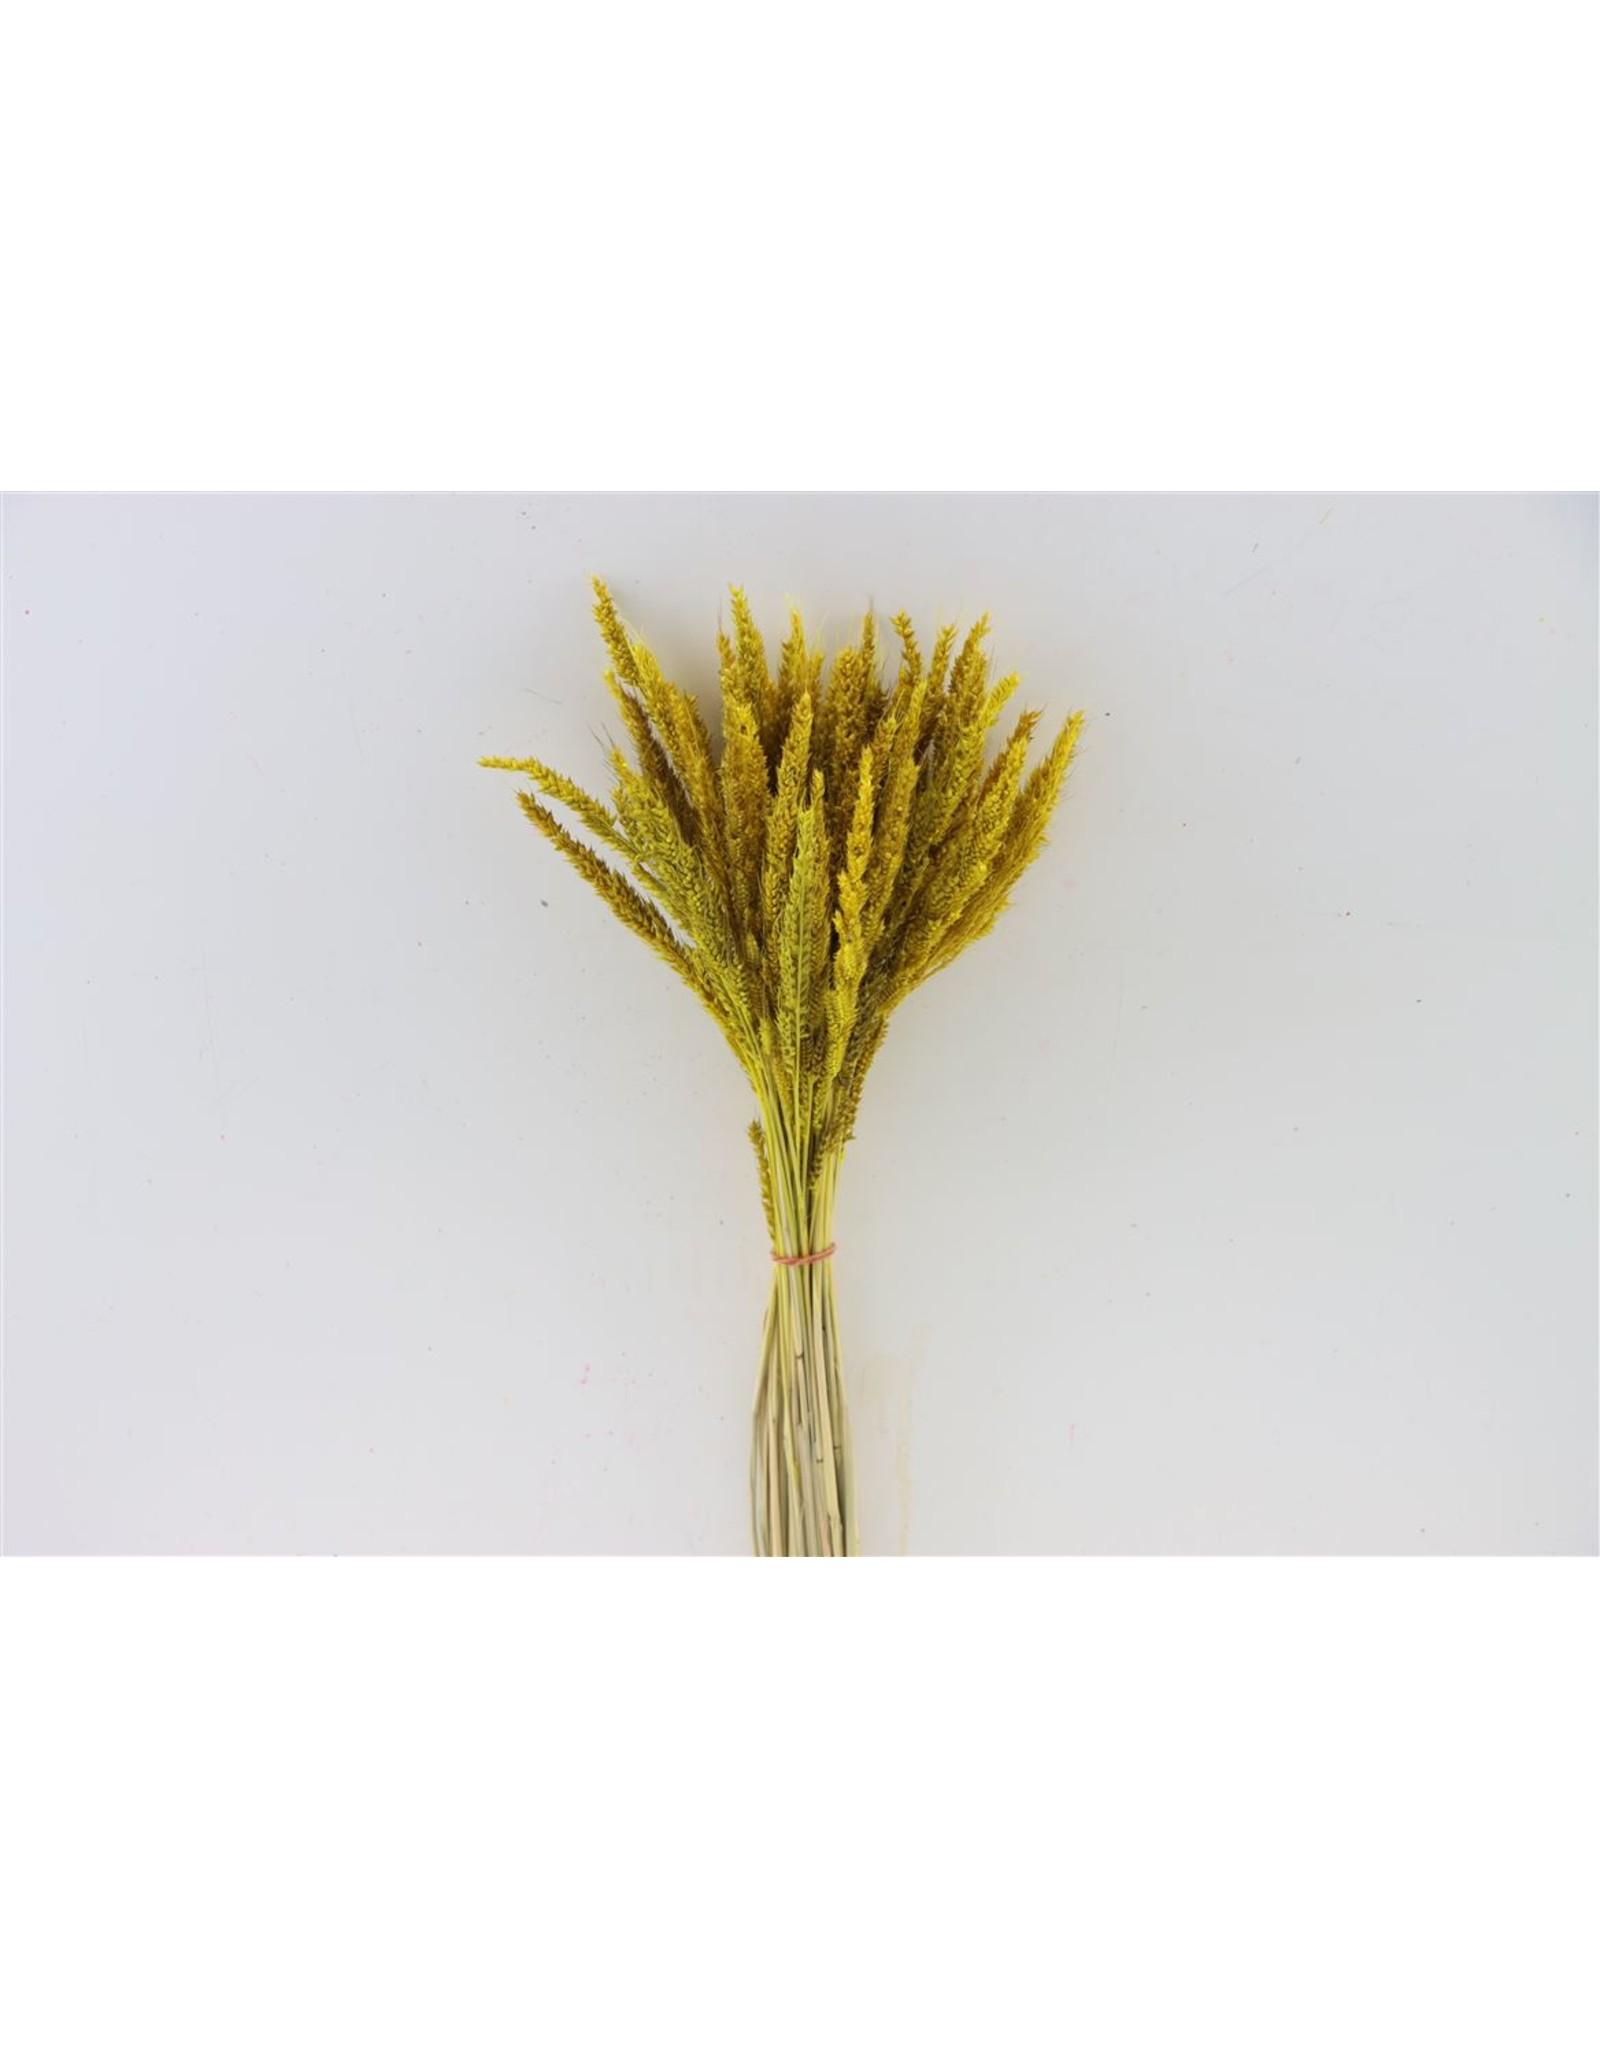 Dried Pinion Grass Yellow Bunch x 20